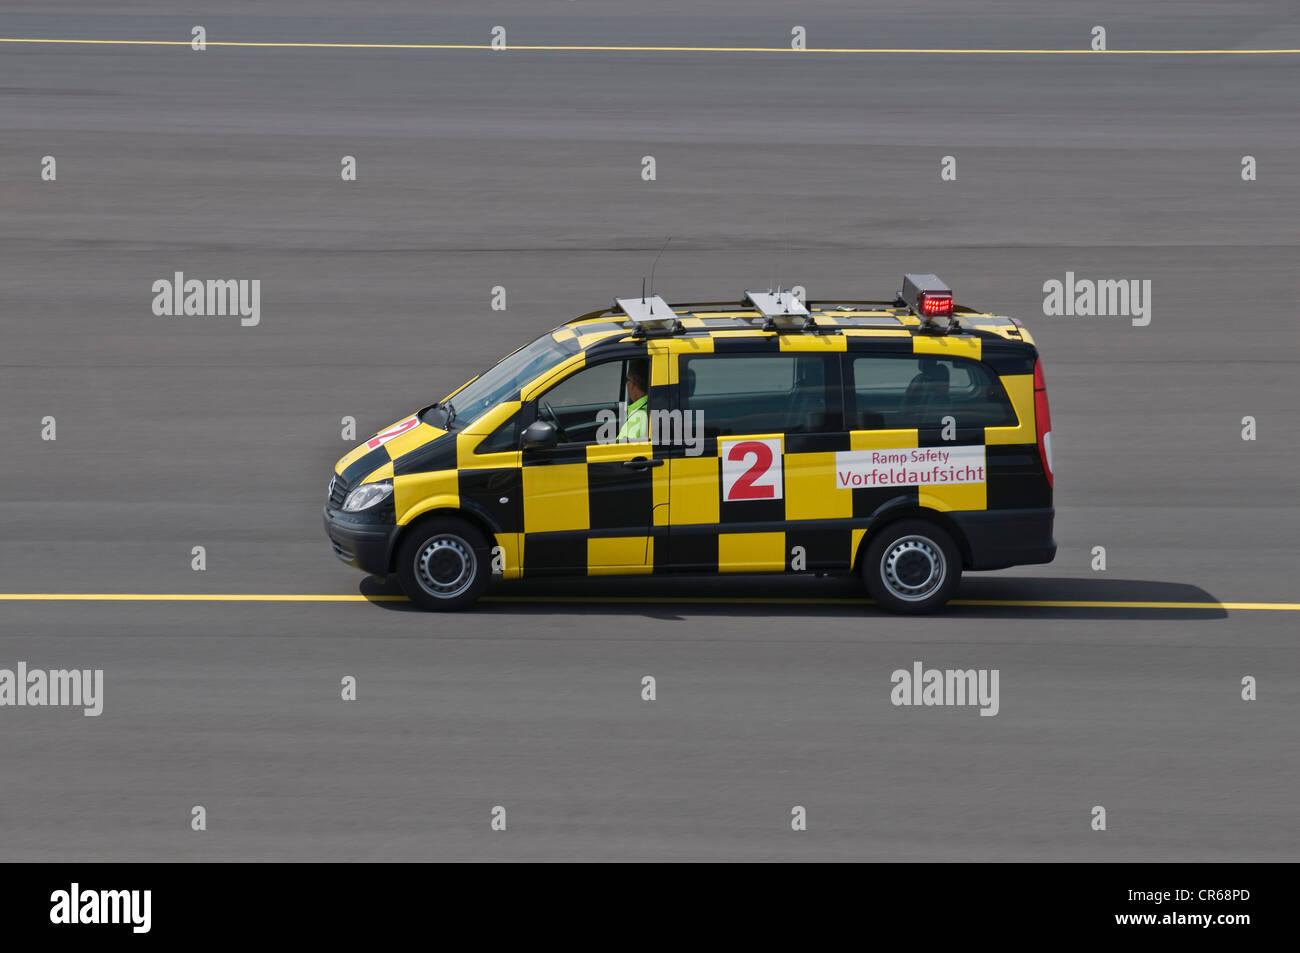 Vehicle of the airport authority, Duesseldorf International Airport, Duesseldorf, North Rhine-Westphalia, Germany, - Stock Image